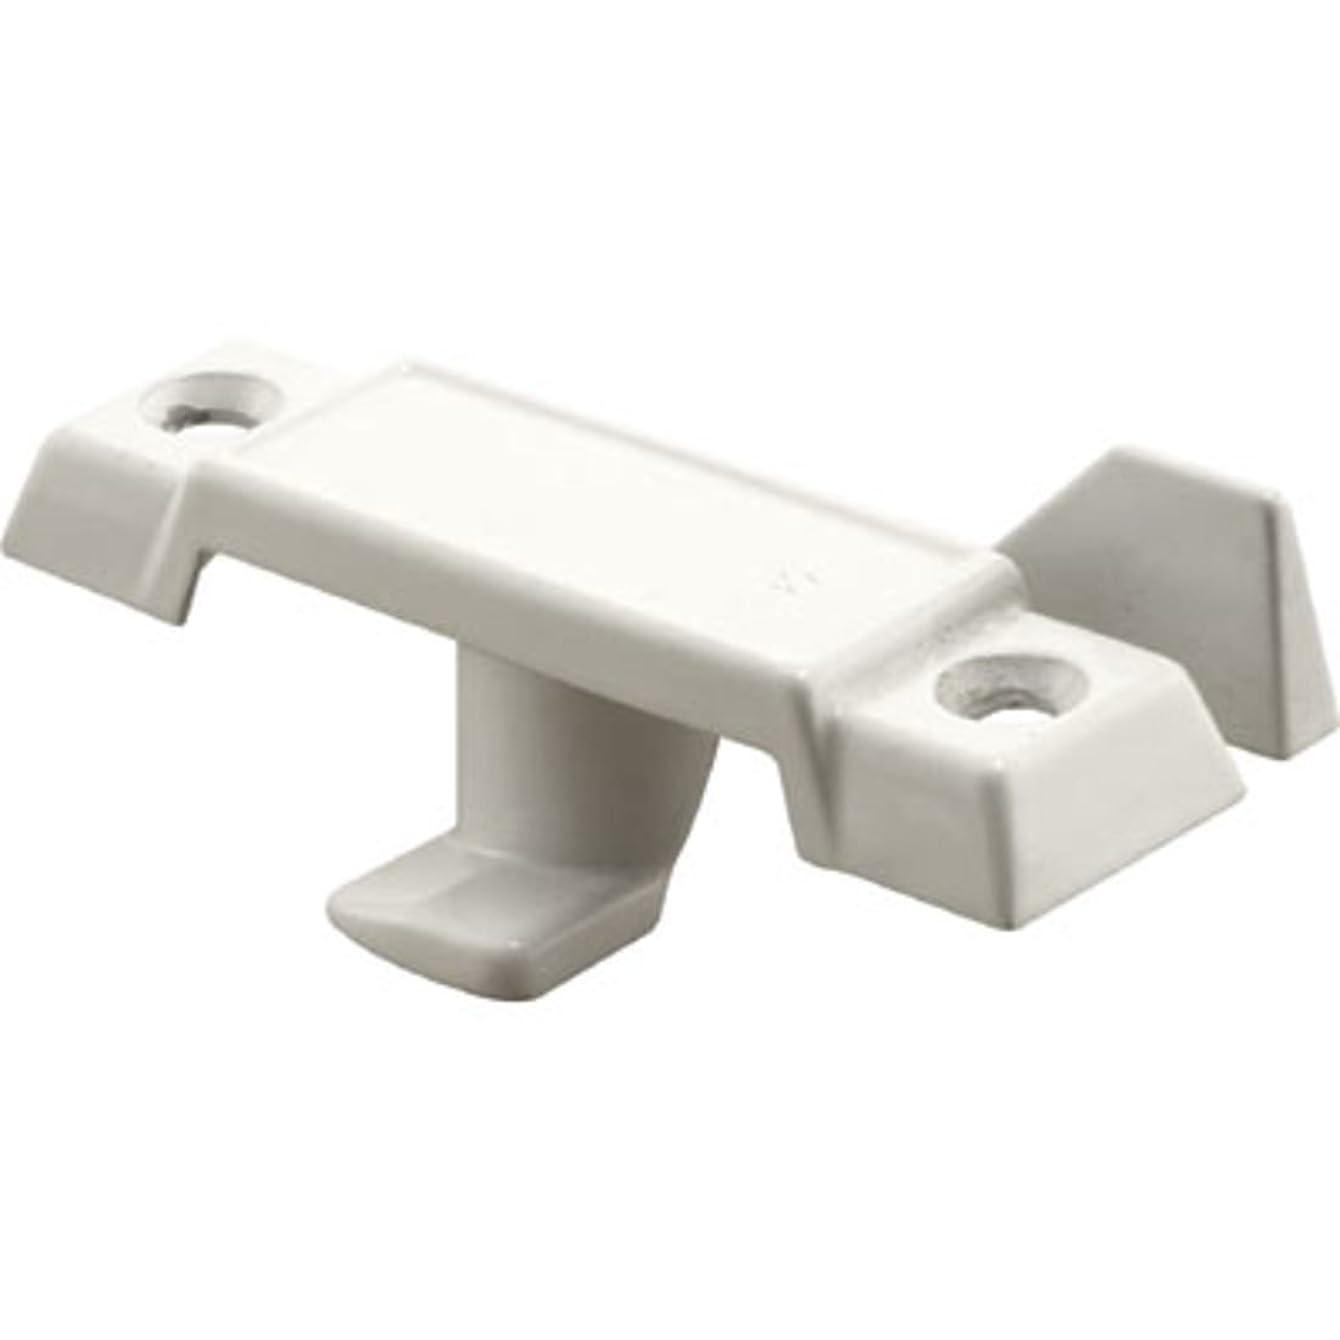 White Sash Lock 2-1/4